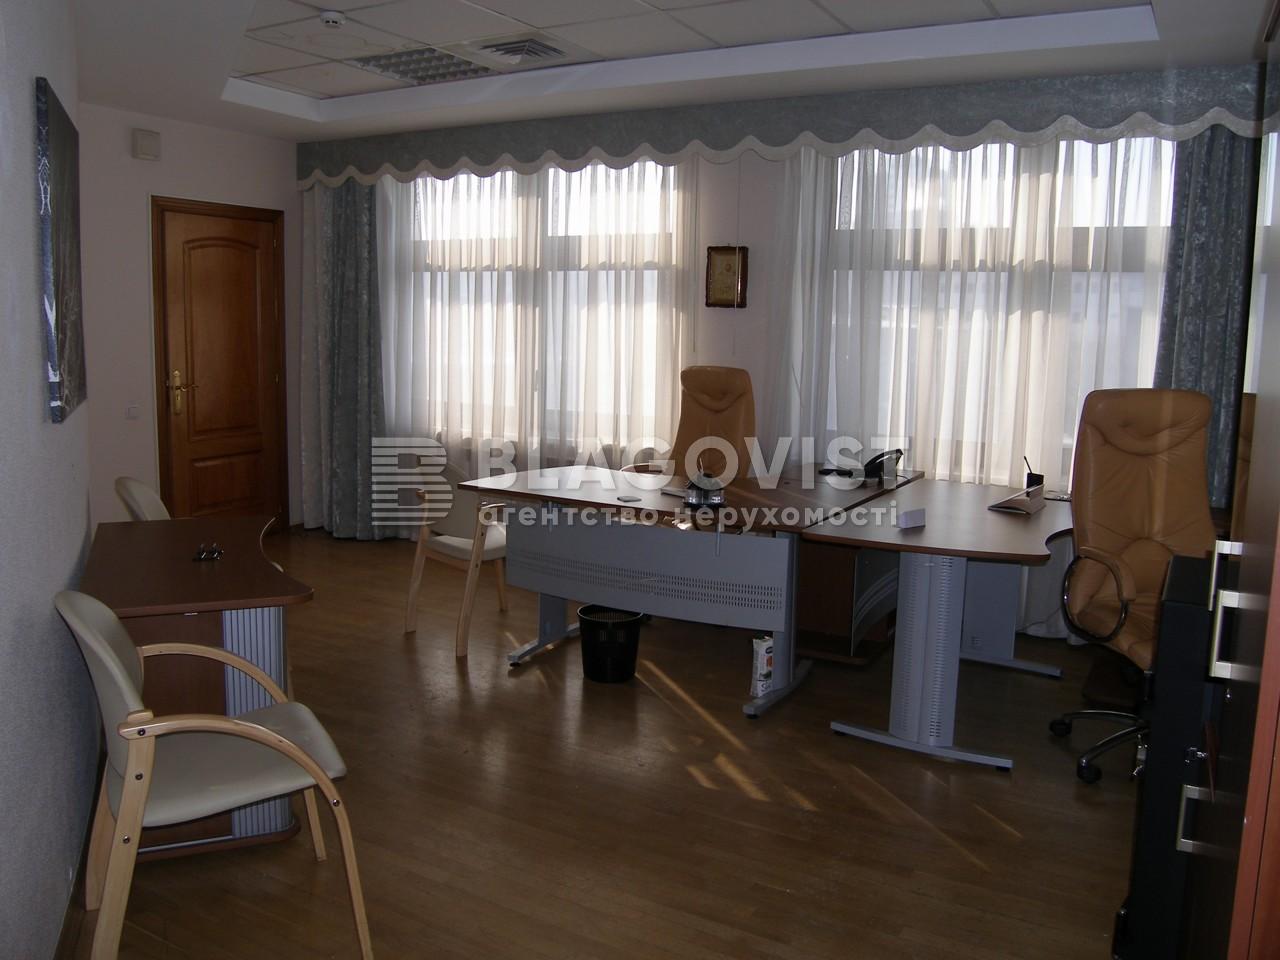 Бизнес-центр, H-37819, Петрозаводска, Киев - Фото 10